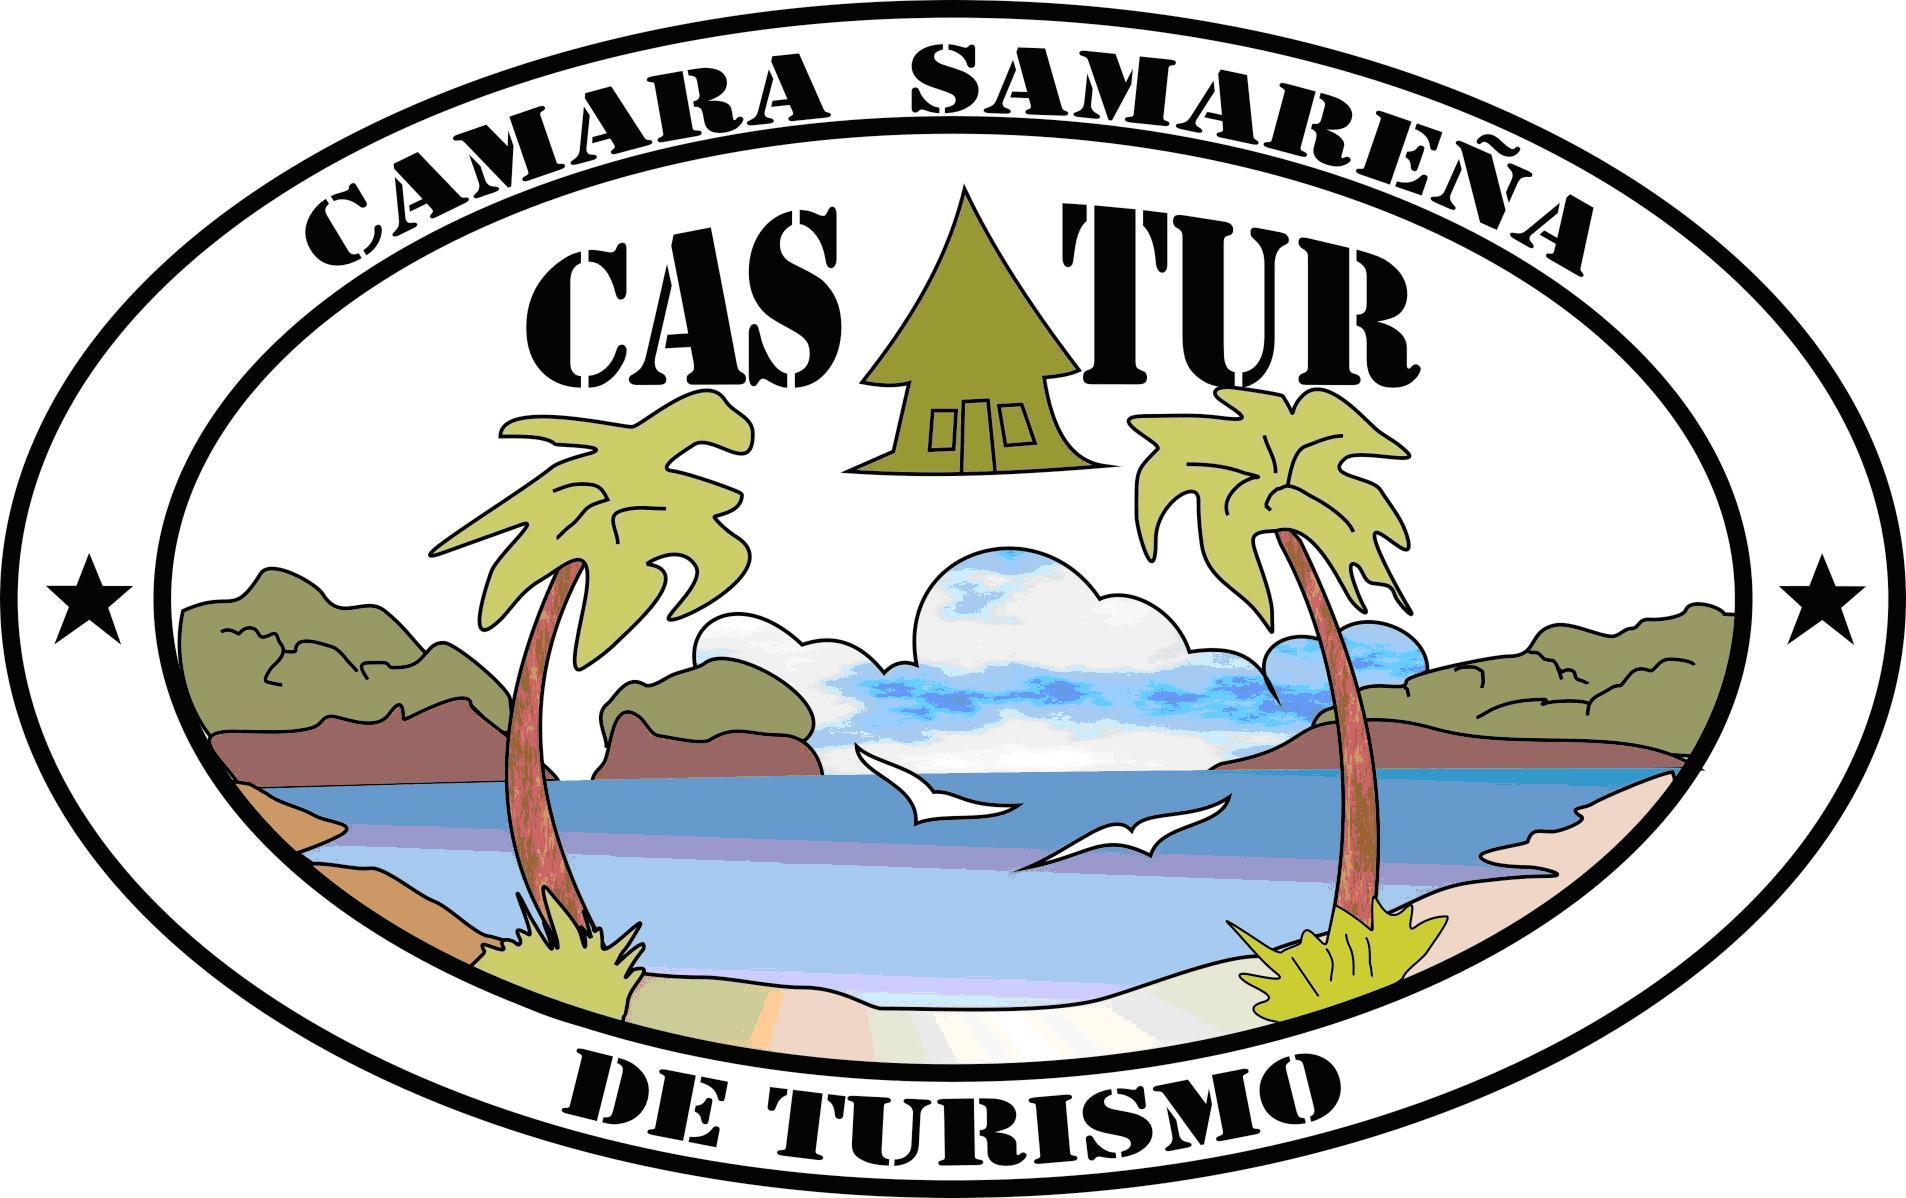 Samara Camara deTurismo